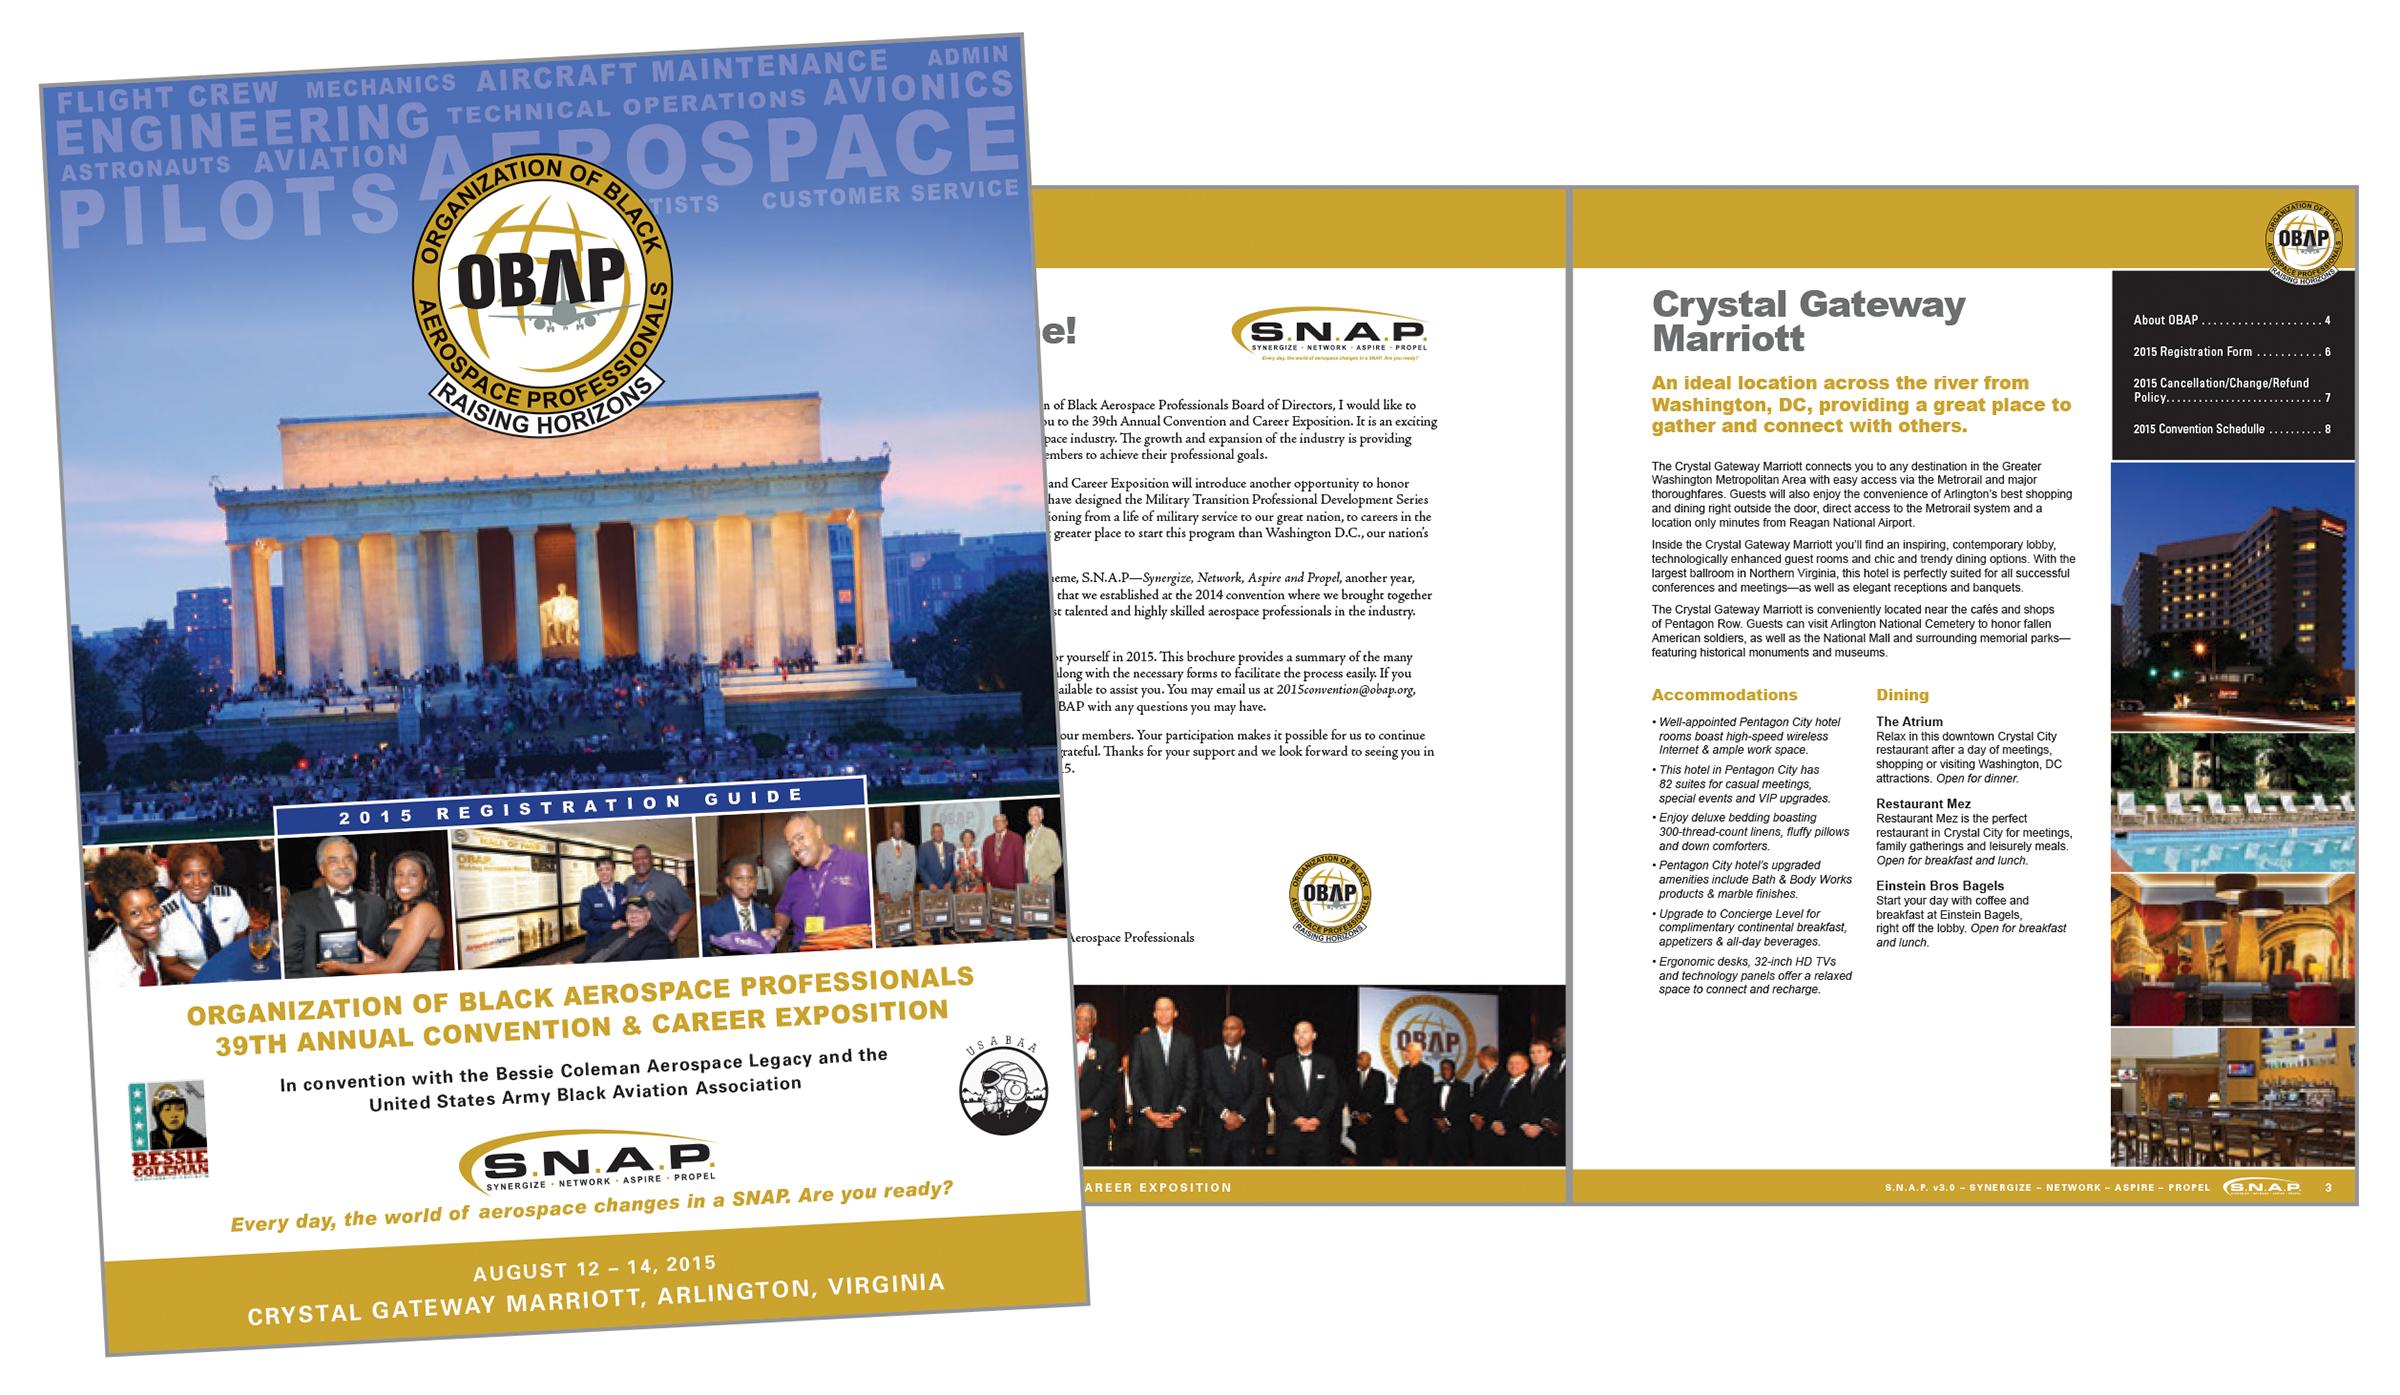 OBAP-convention-registration-guide.jpg